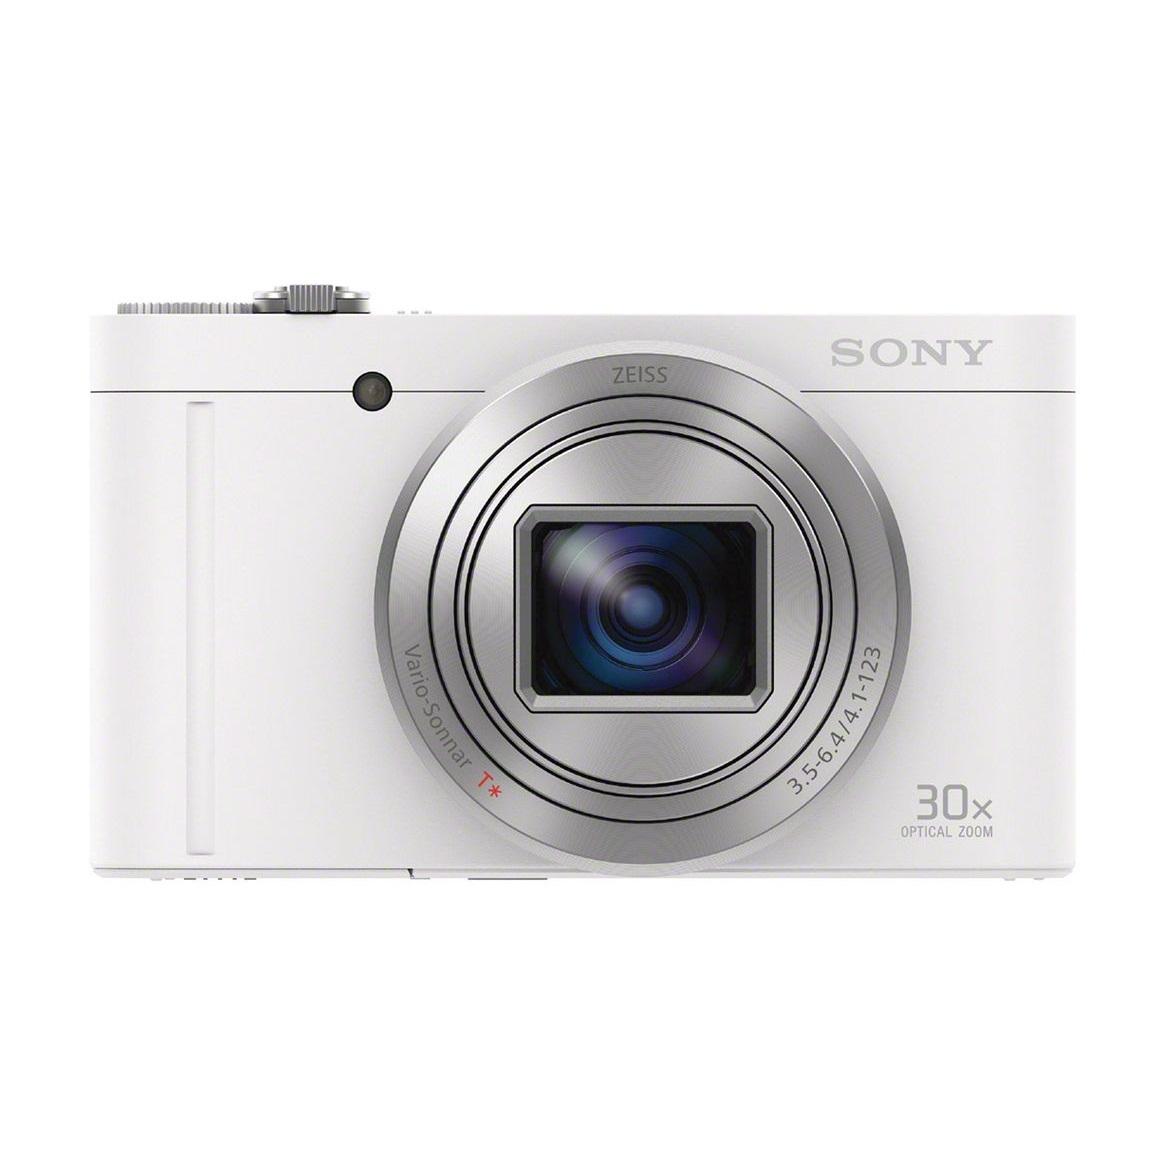 Máy ảnh KTS Sony CyberShot DSC-WX500 - Trắng